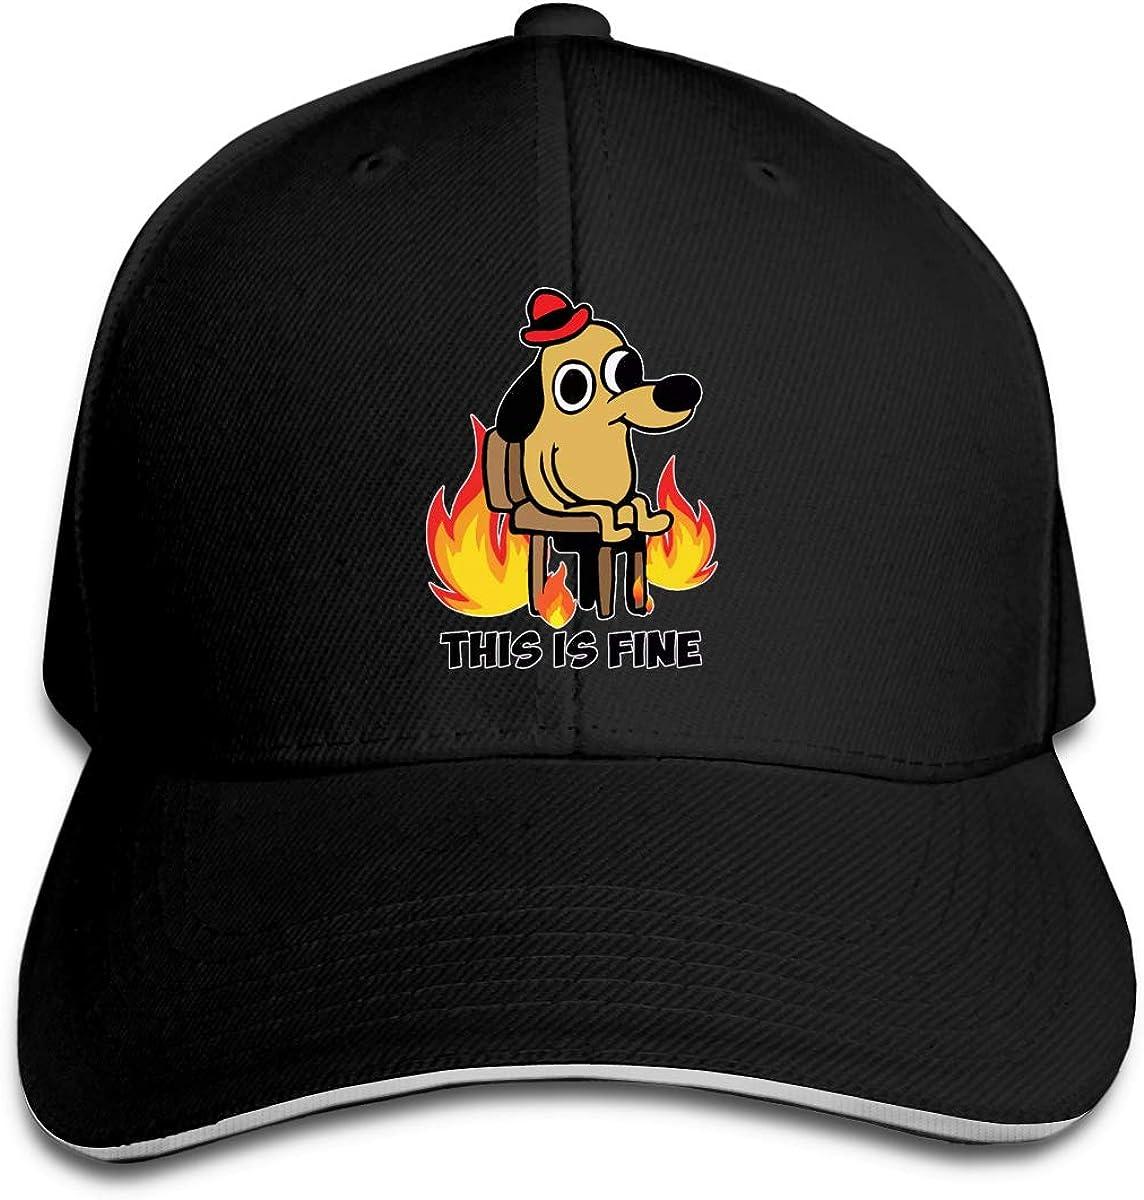 United States Service Dogs Snapback Sandwich Cap Adjustable Baseball Hat Trucker Cap